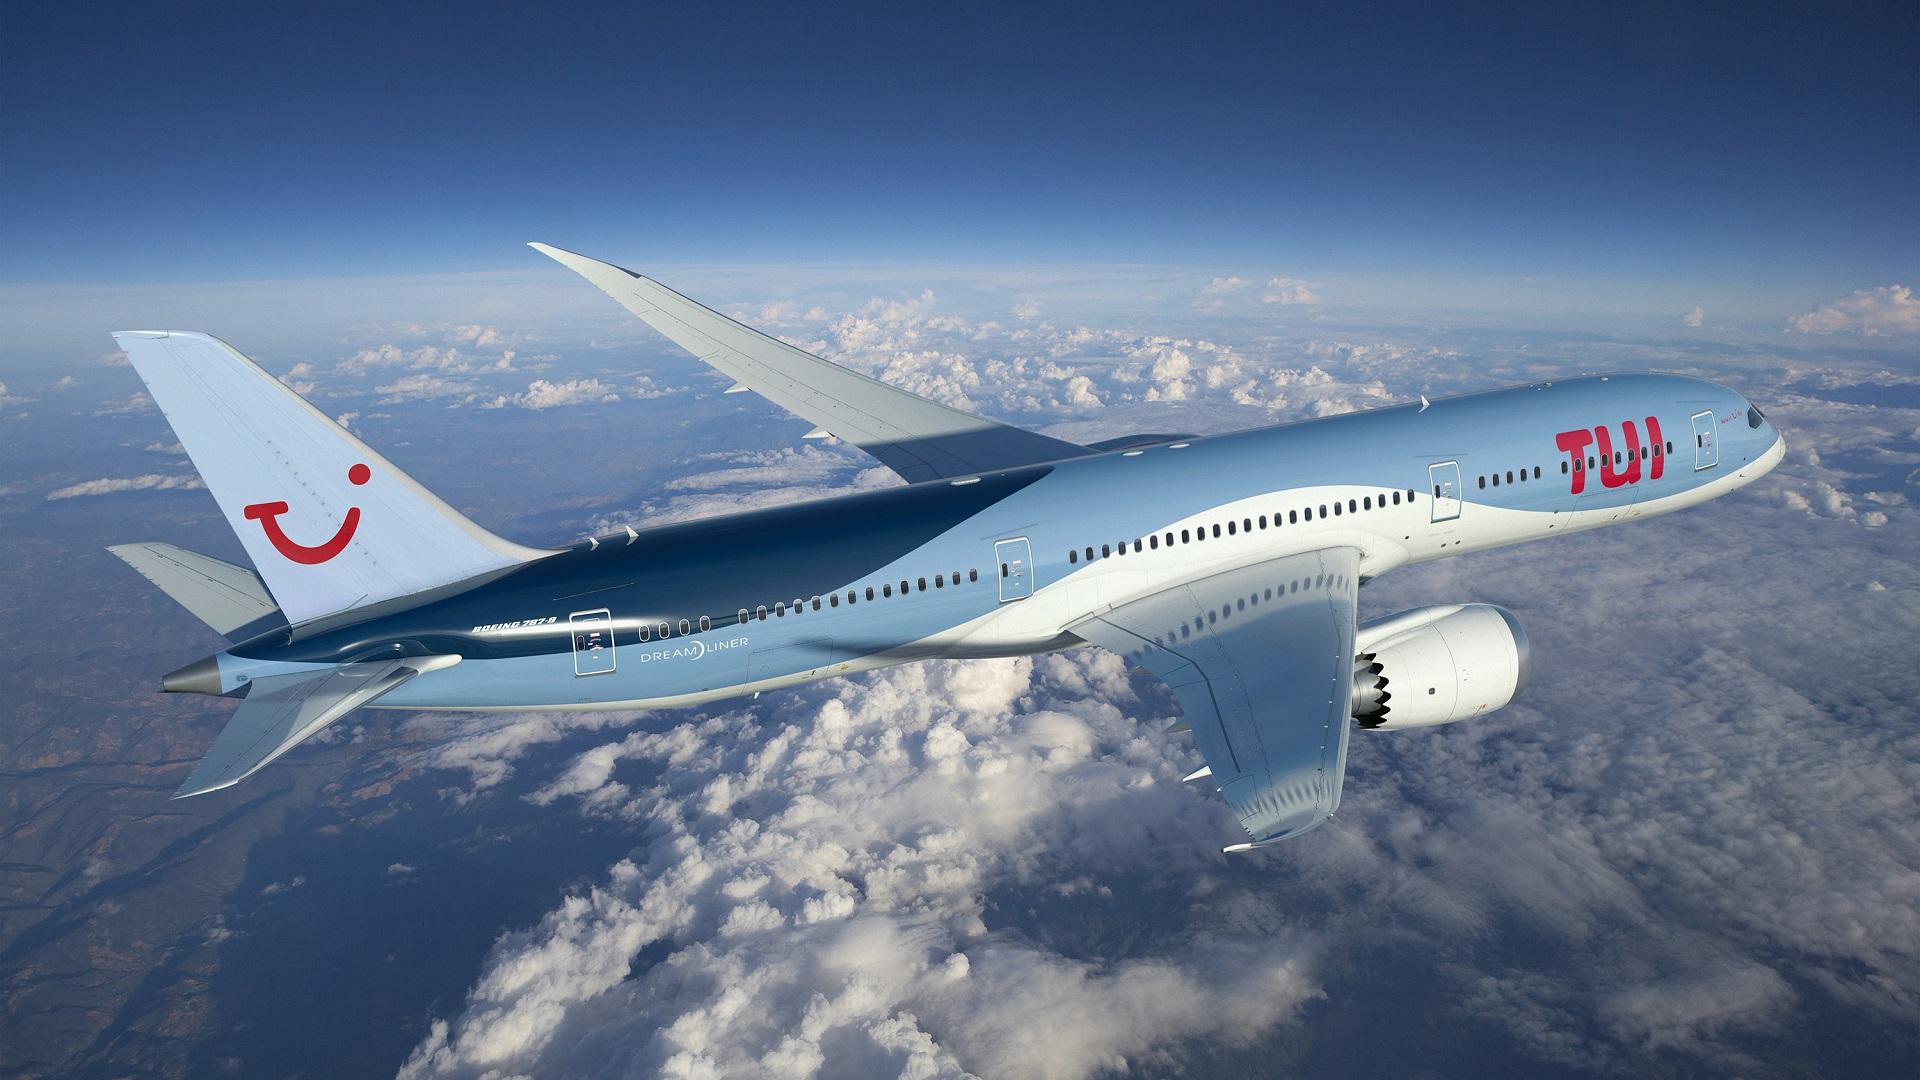 TUI fly Belgium - Wikipedia